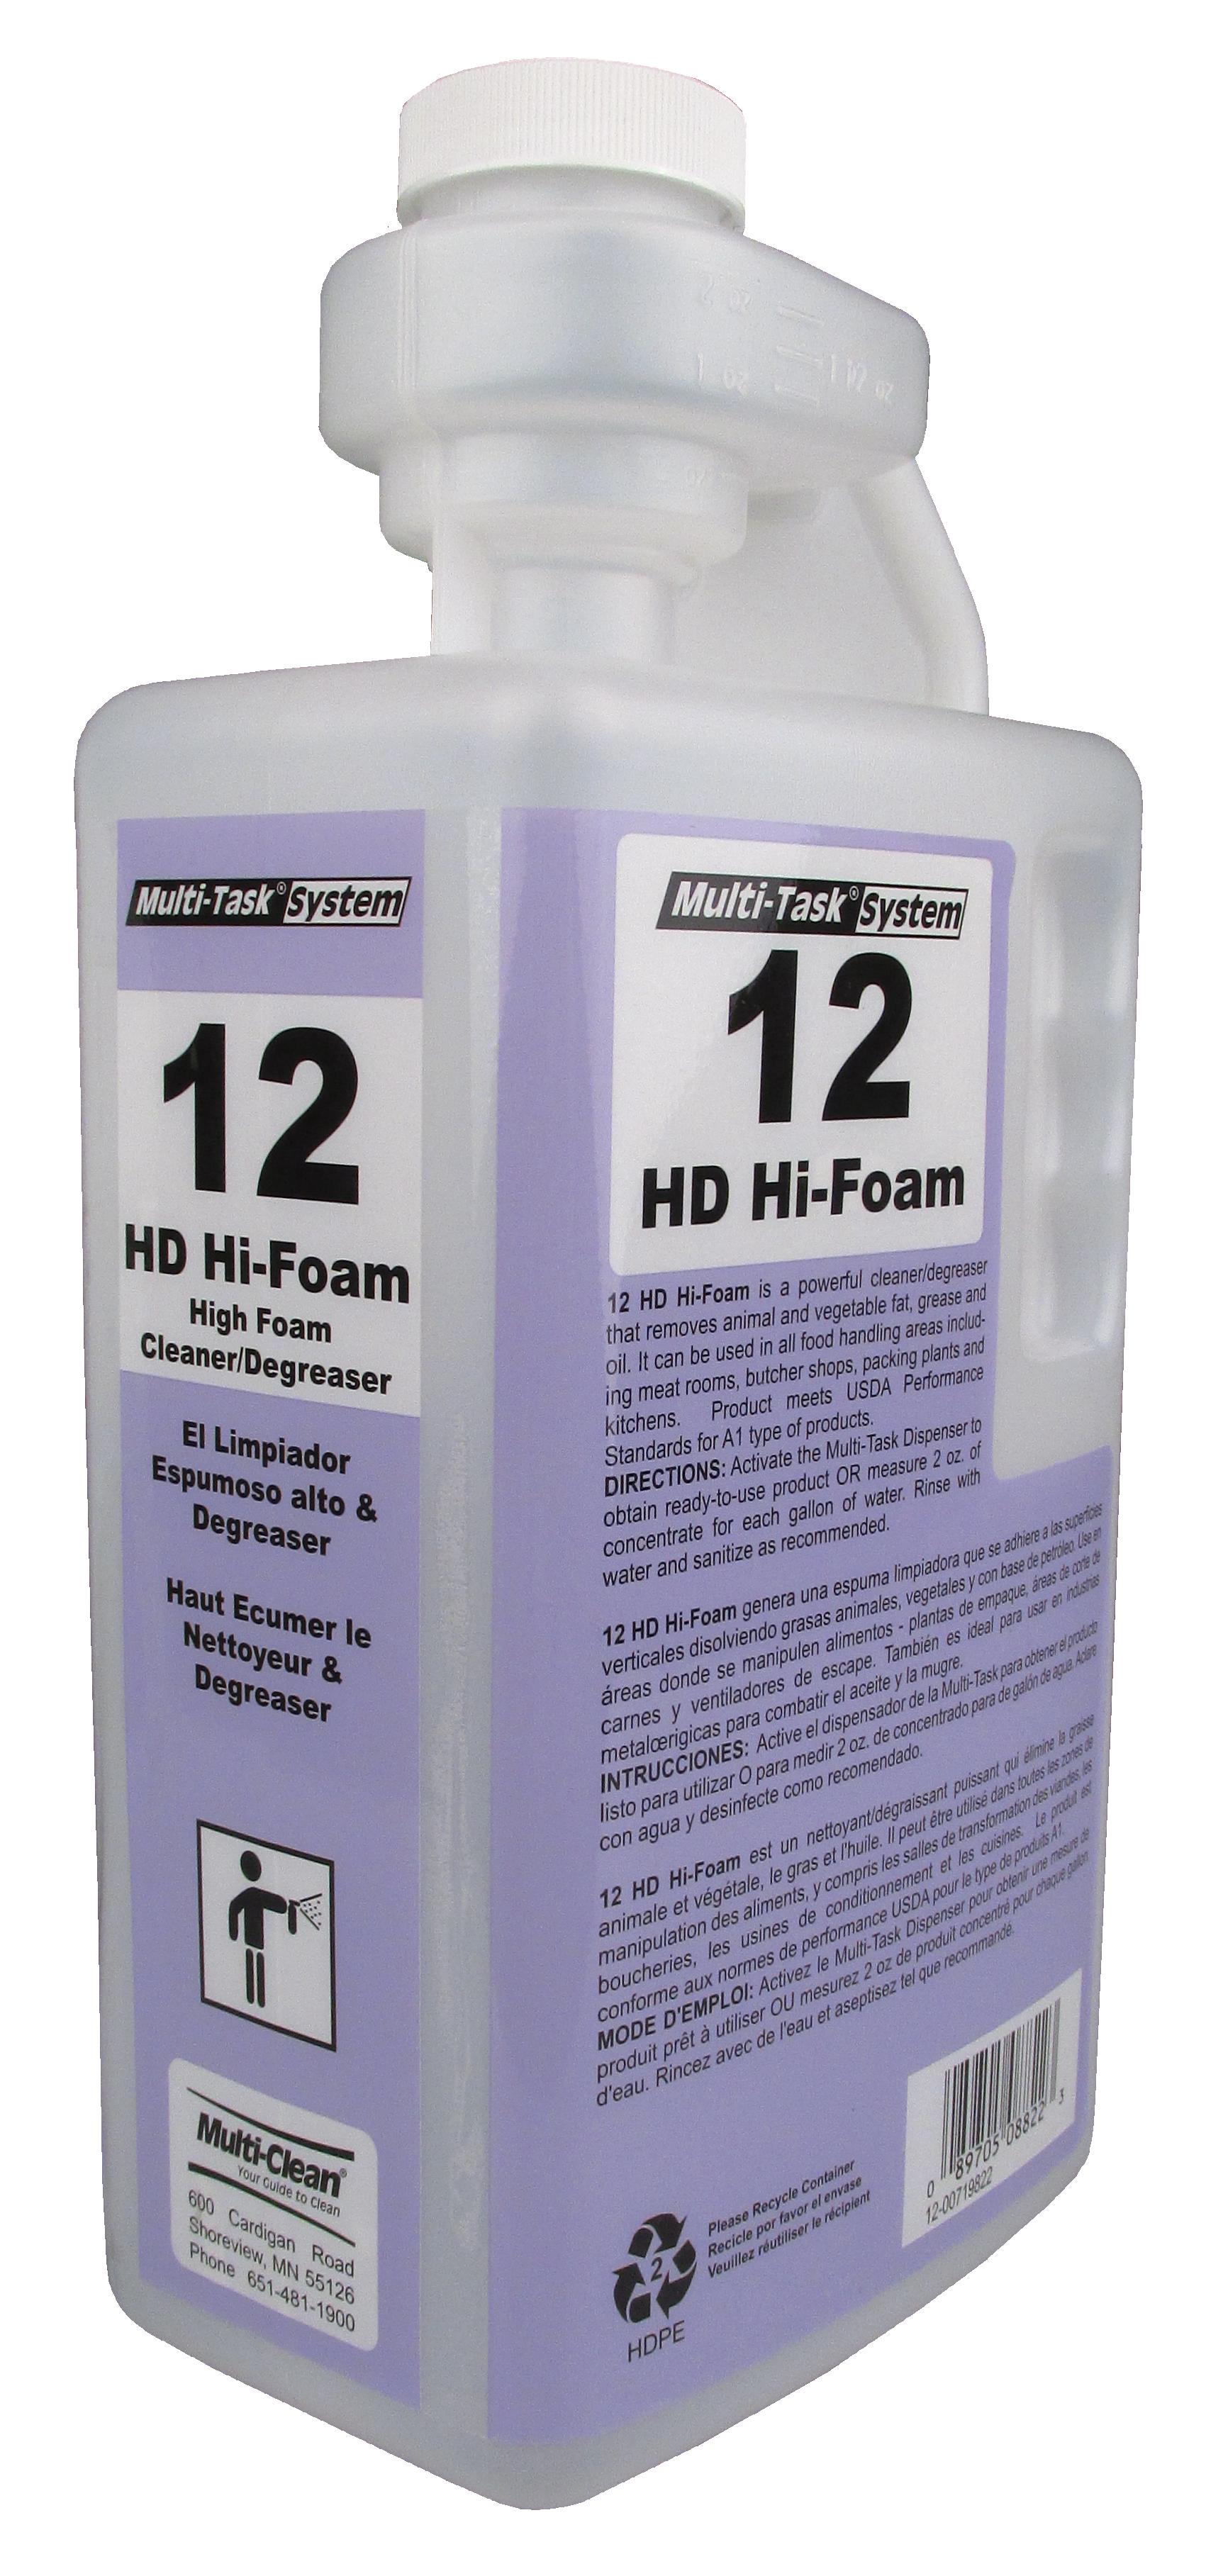 12HDHi-FoamMT-158x254